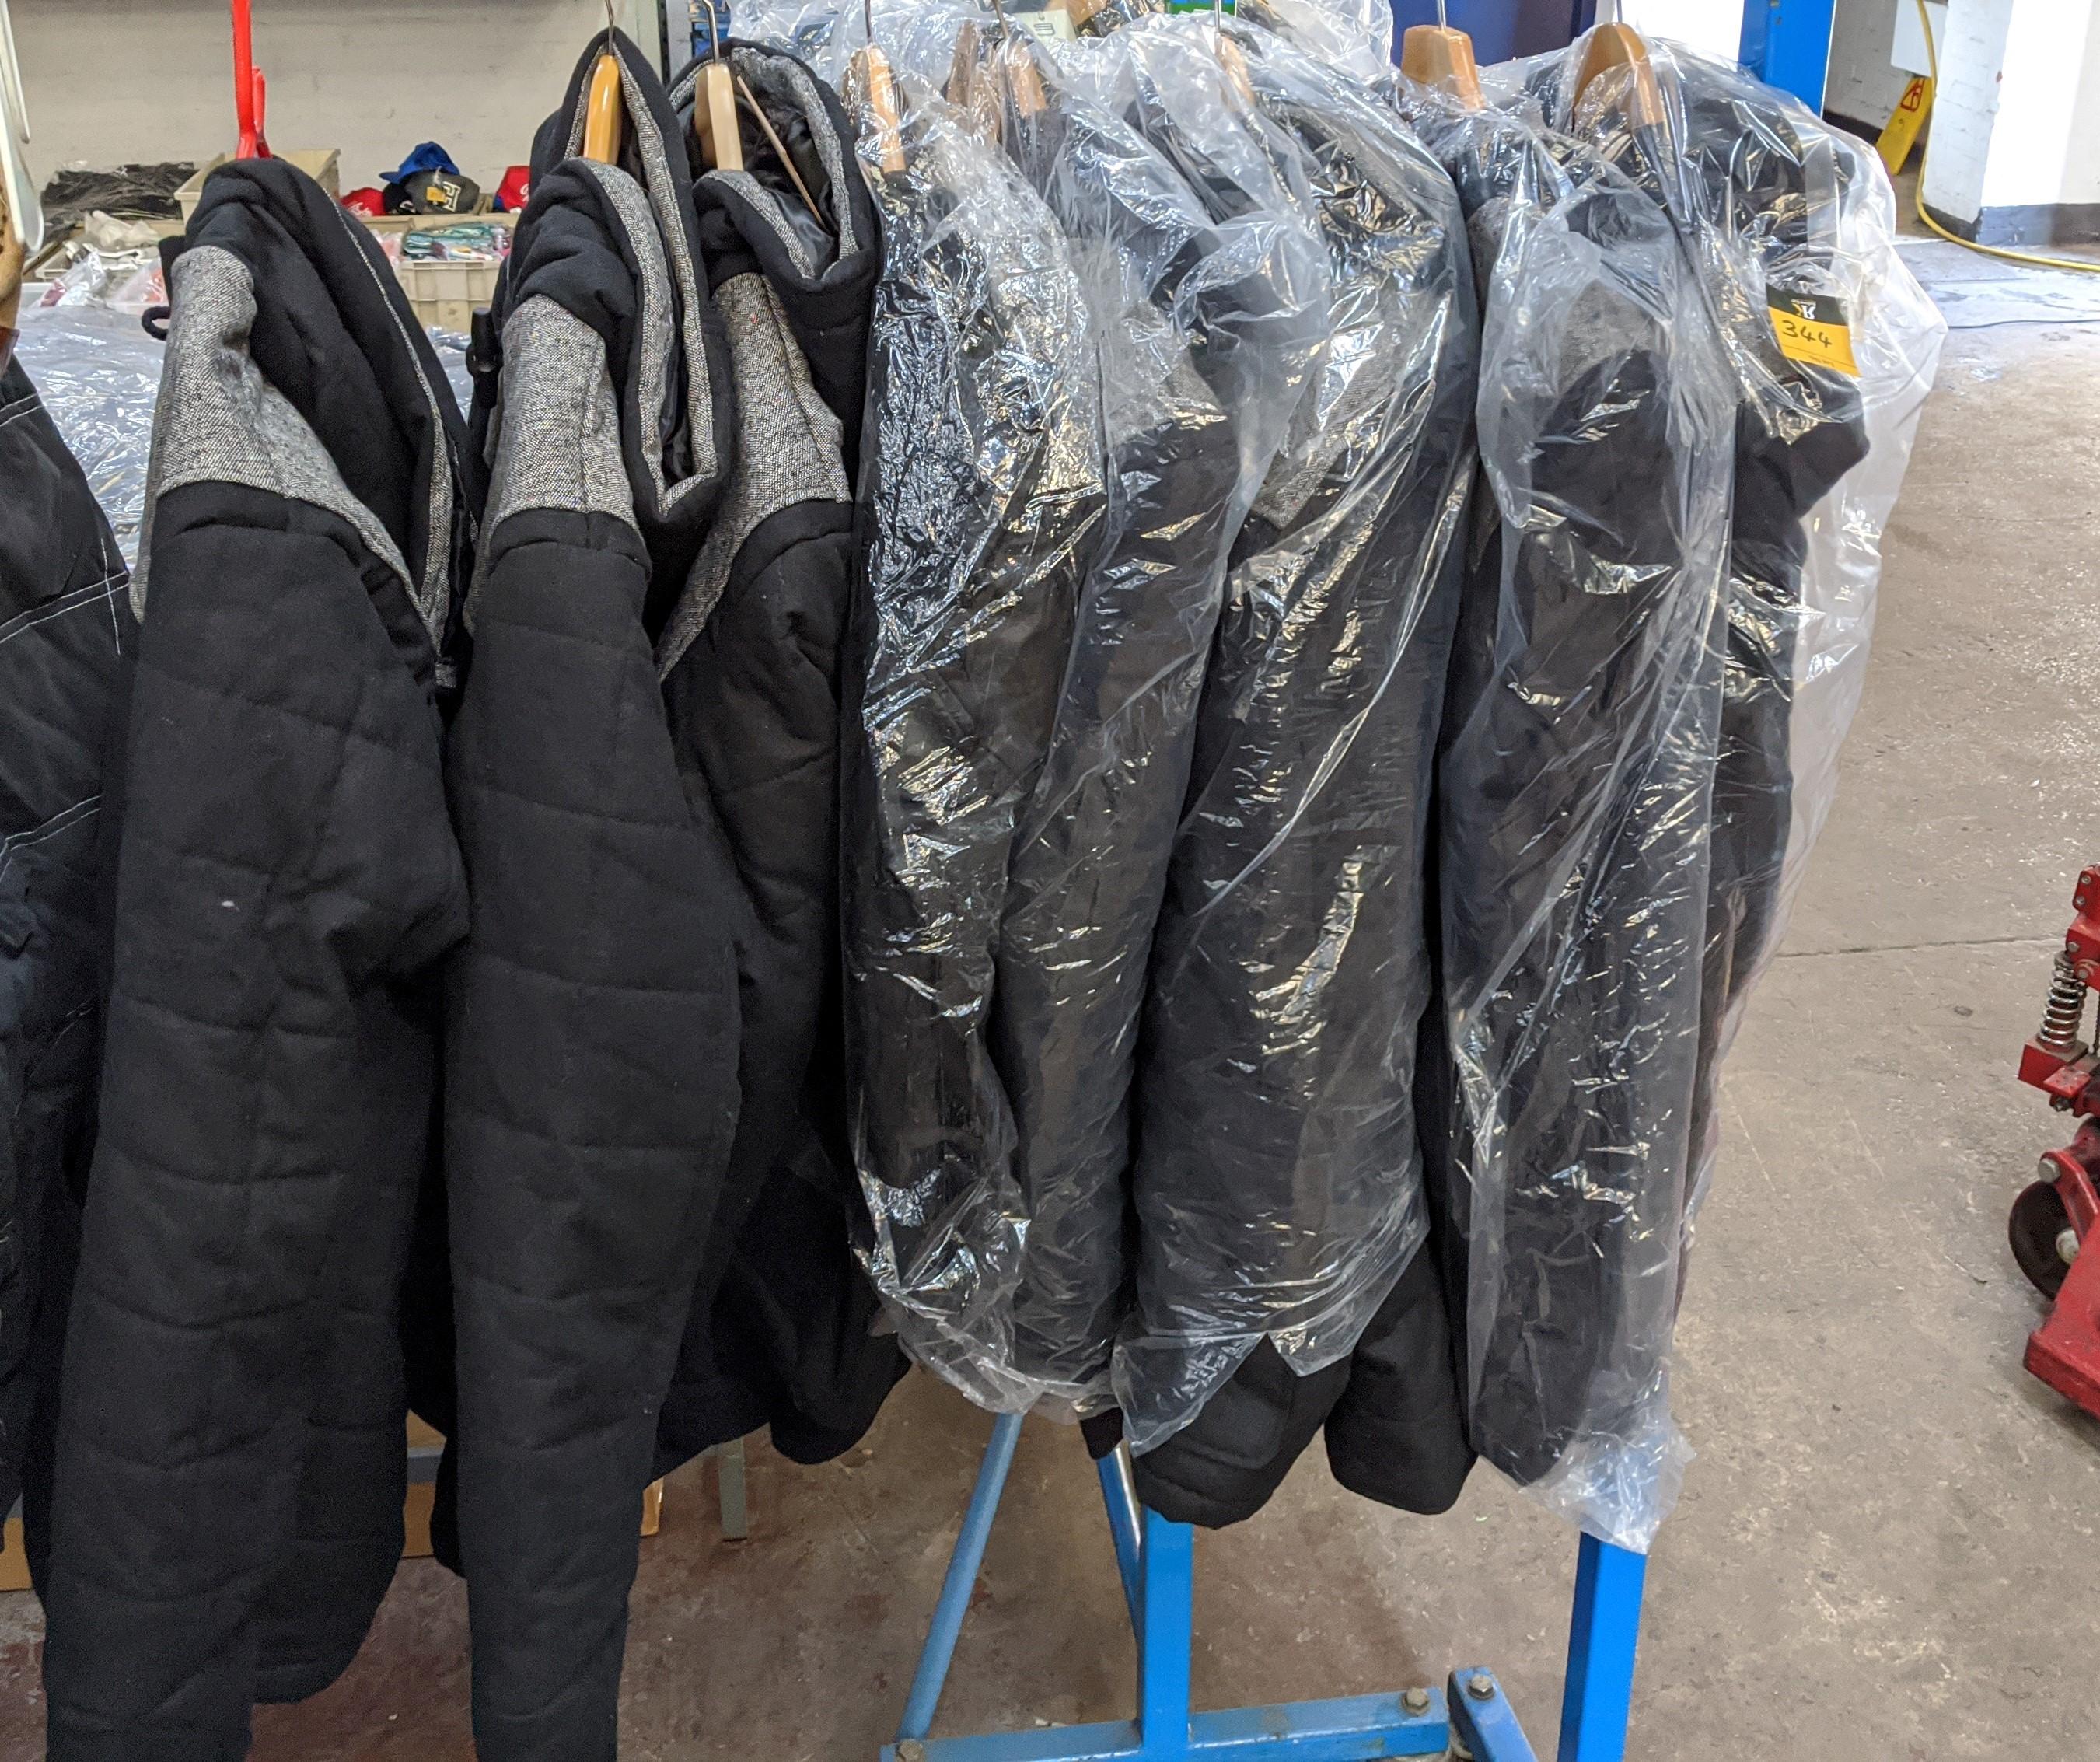 Very large quantity of primarily men's designer clothing & accessories. - Image 107 of 157